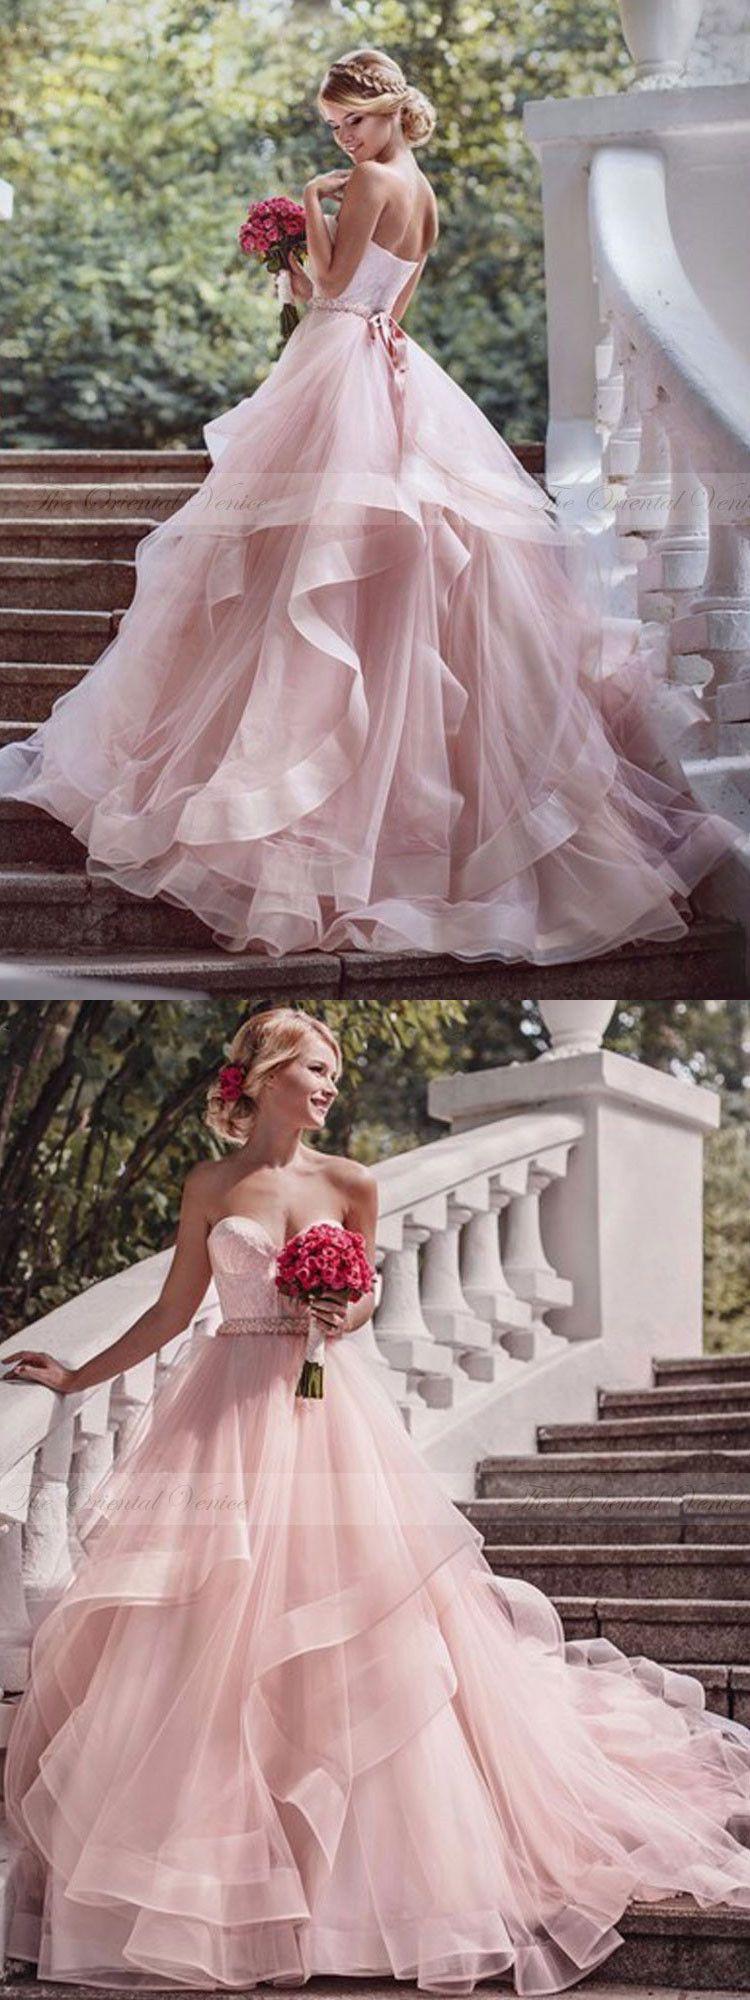 Gorgeous aline strapless pink long wedding dress style